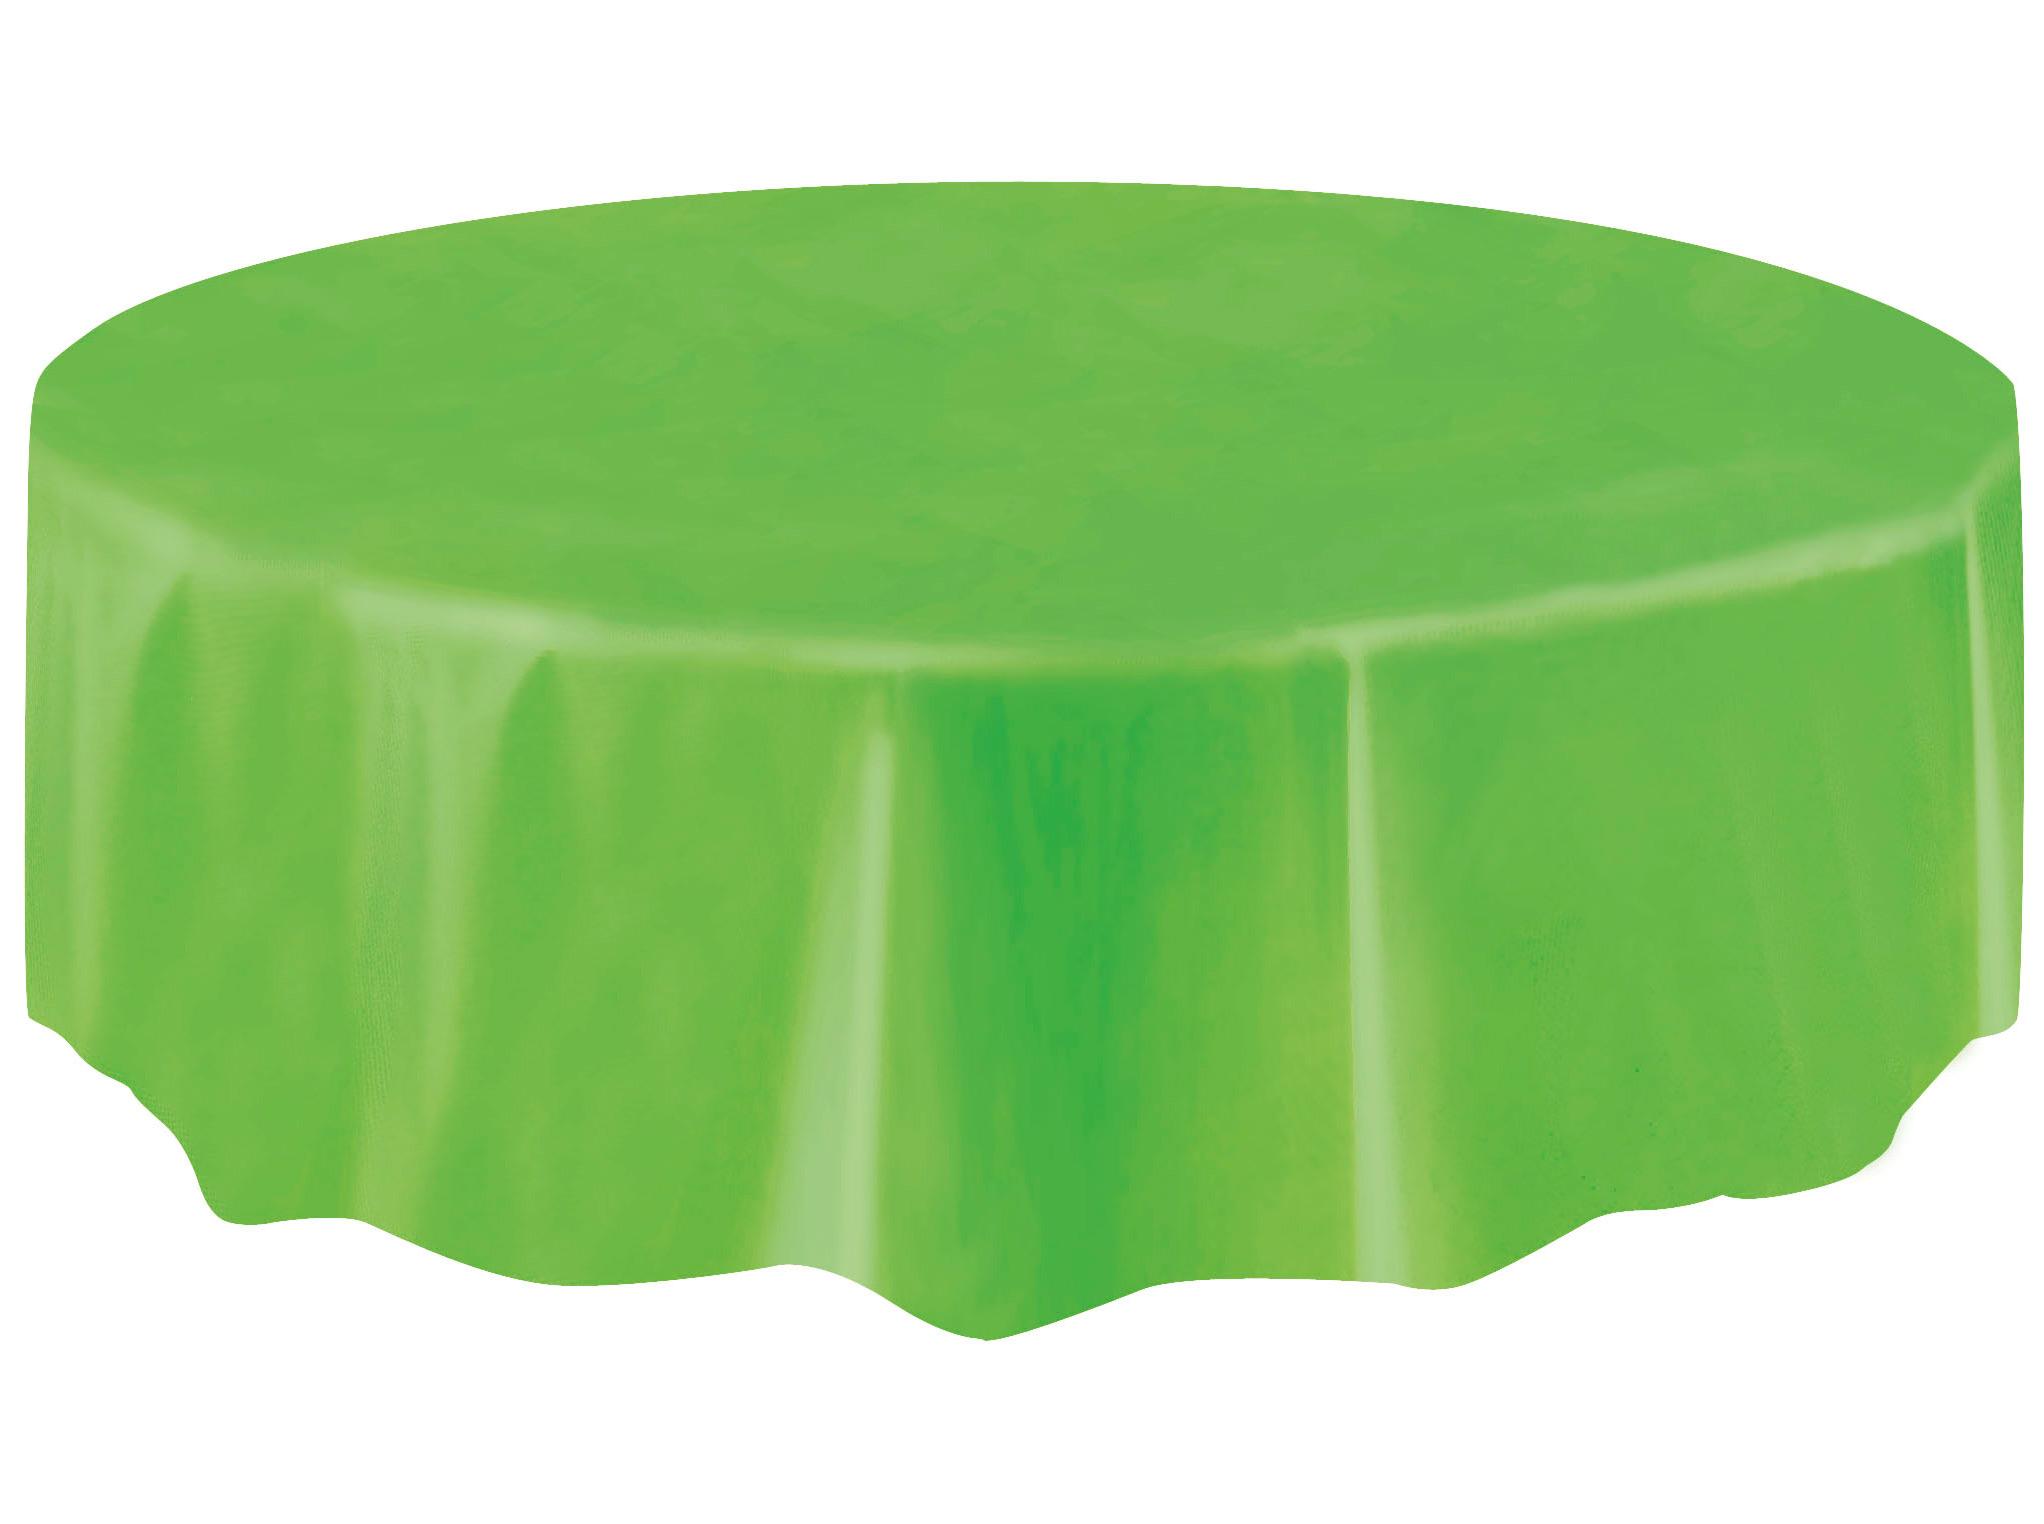 nappe ronde en plastique vert citron. Black Bedroom Furniture Sets. Home Design Ideas